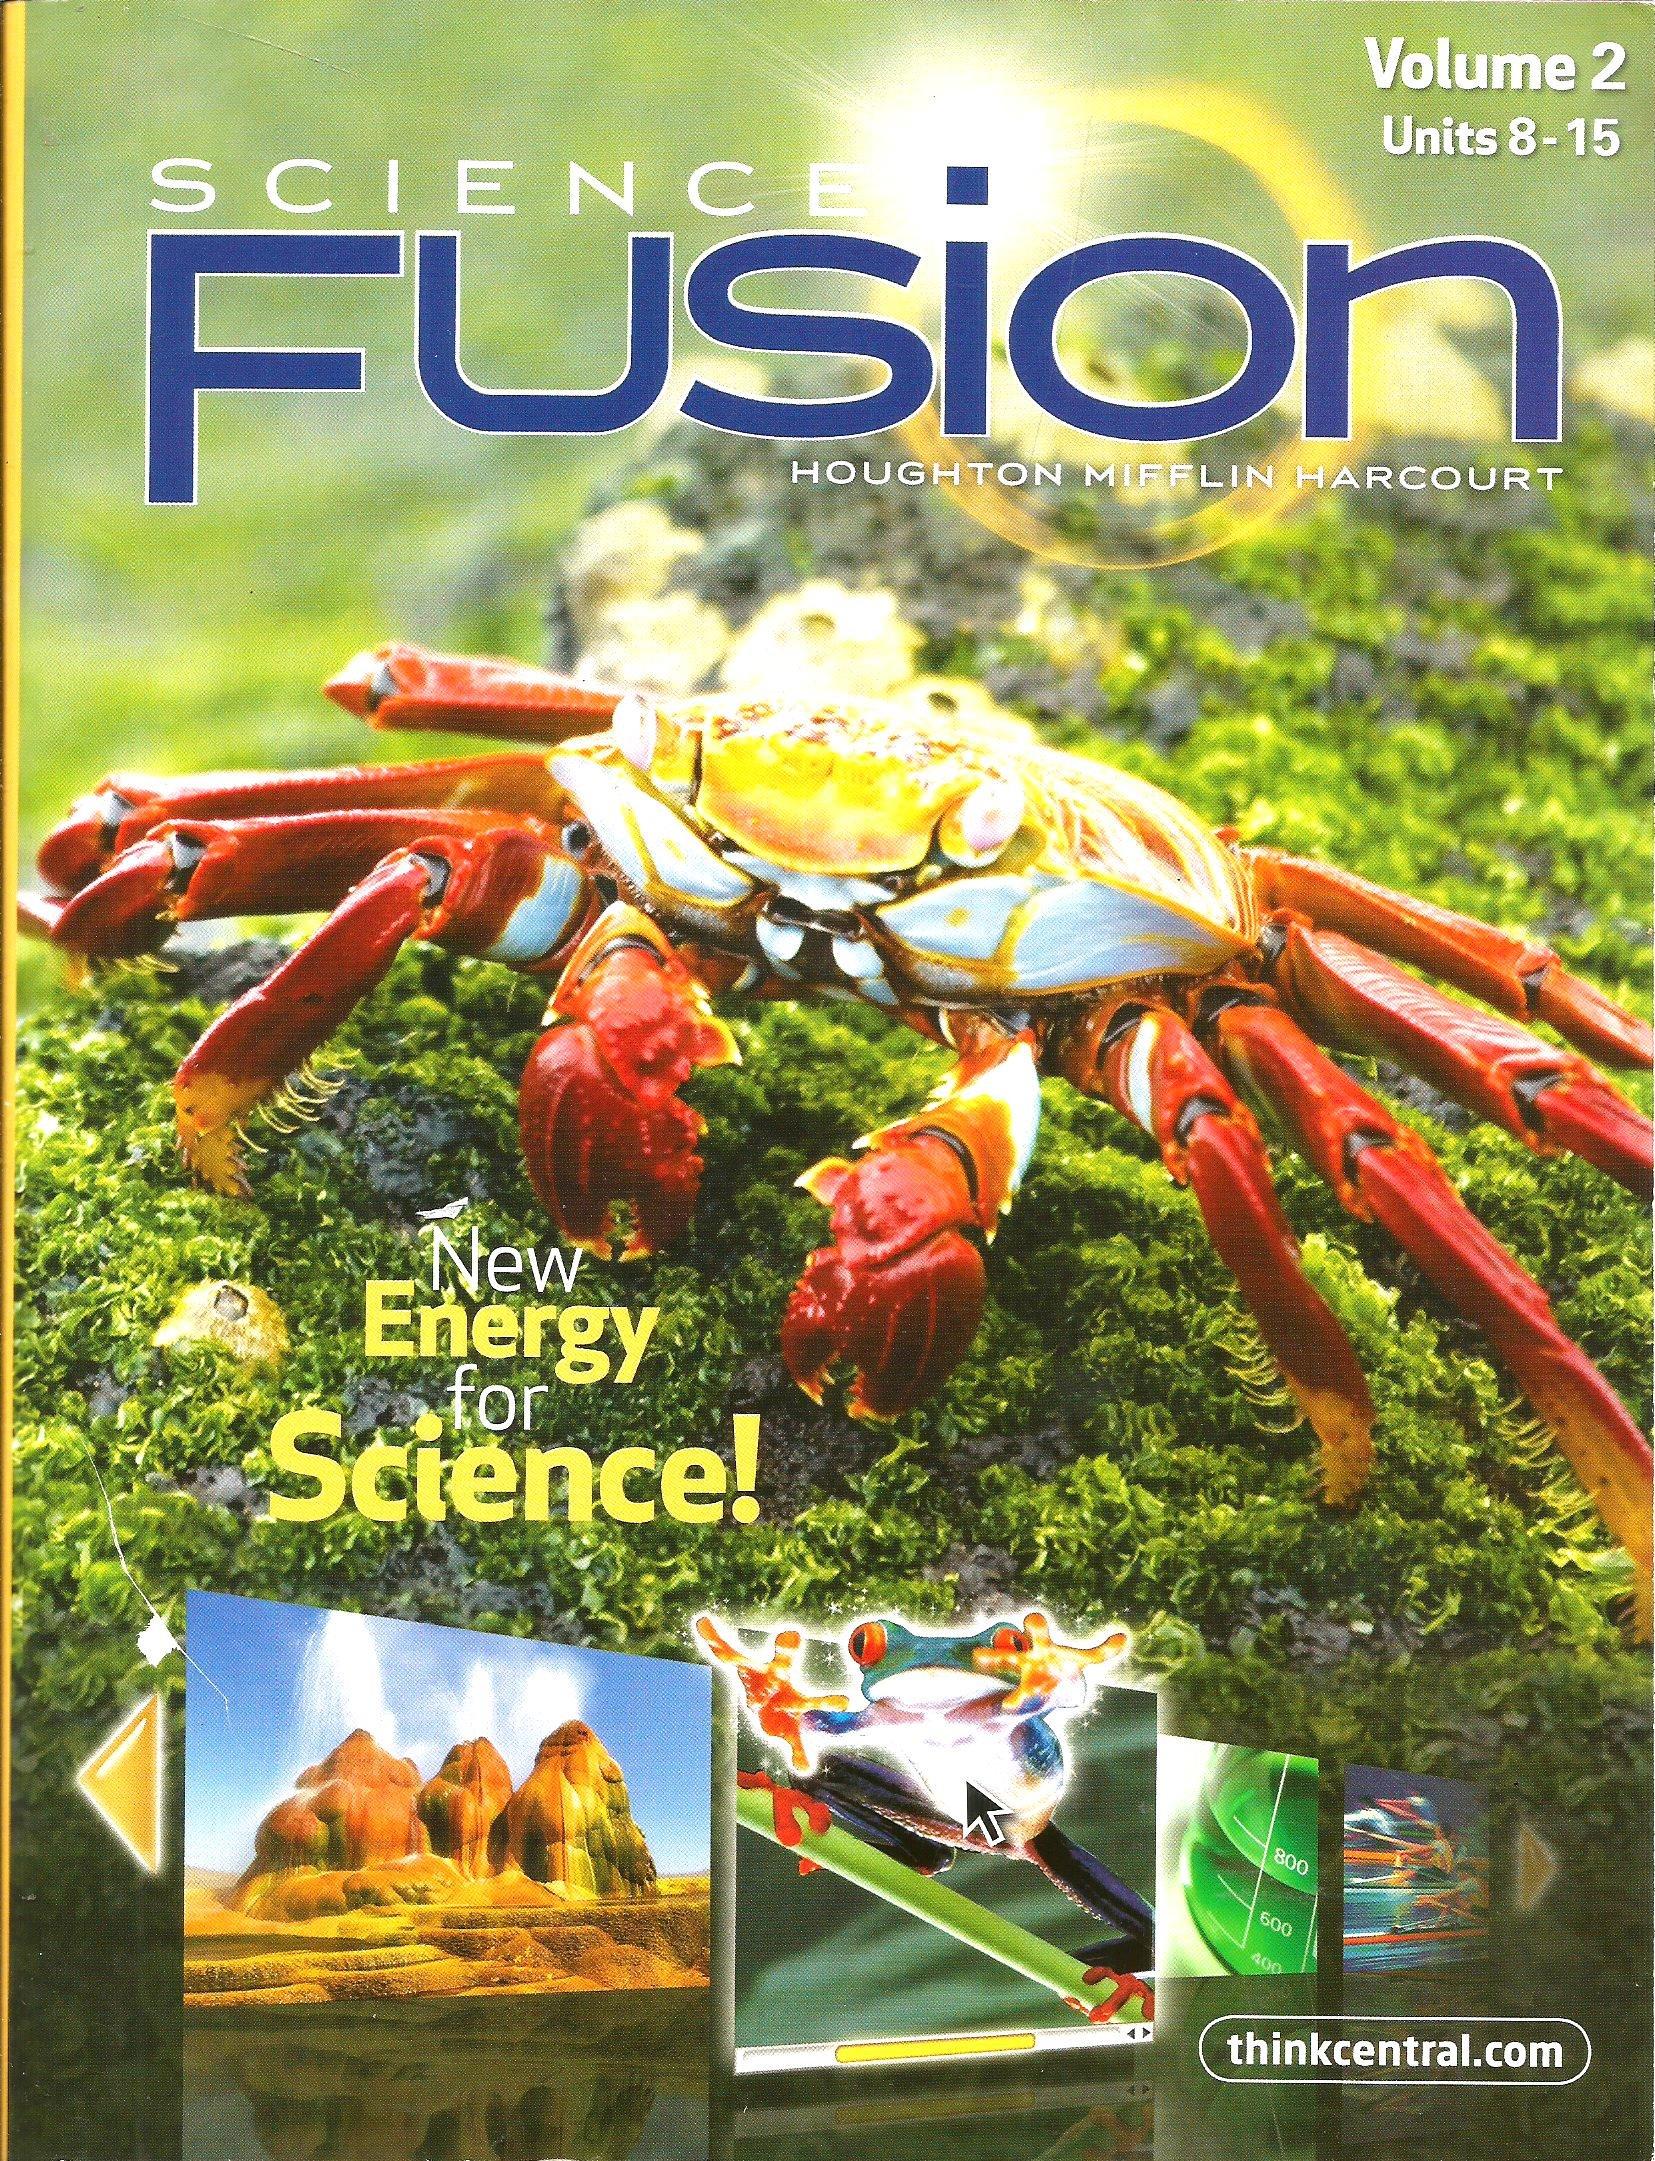 Science fusion new energy for science vol 2 units 8 15 grade 5 science fusion new energy for science vol 2 units 8 15 grade 5 michael a despezio 9780547719375 amazon books fandeluxe Images